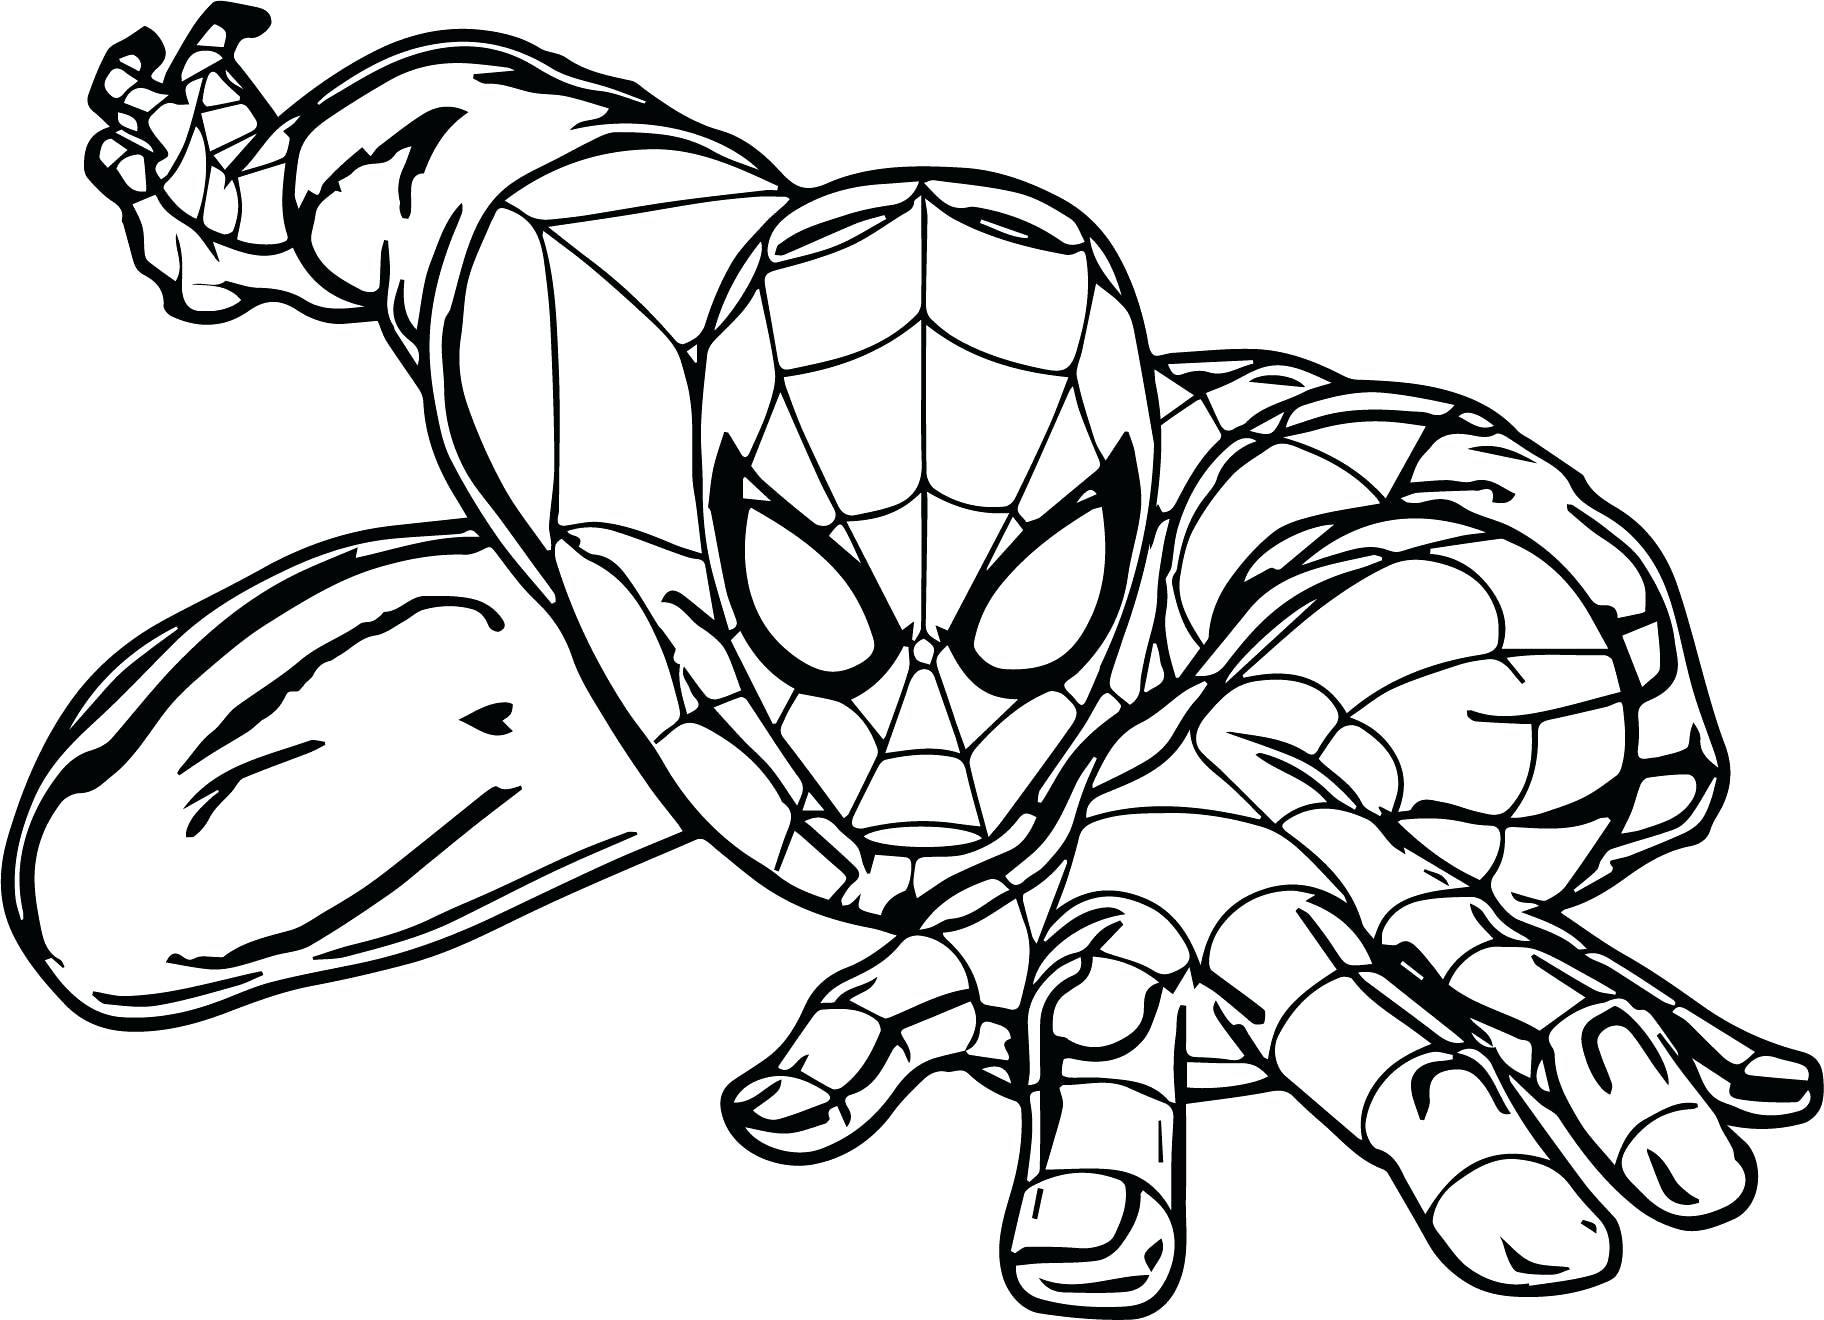 Spider Man Cartoon Drawing at GetDrawings | Free download